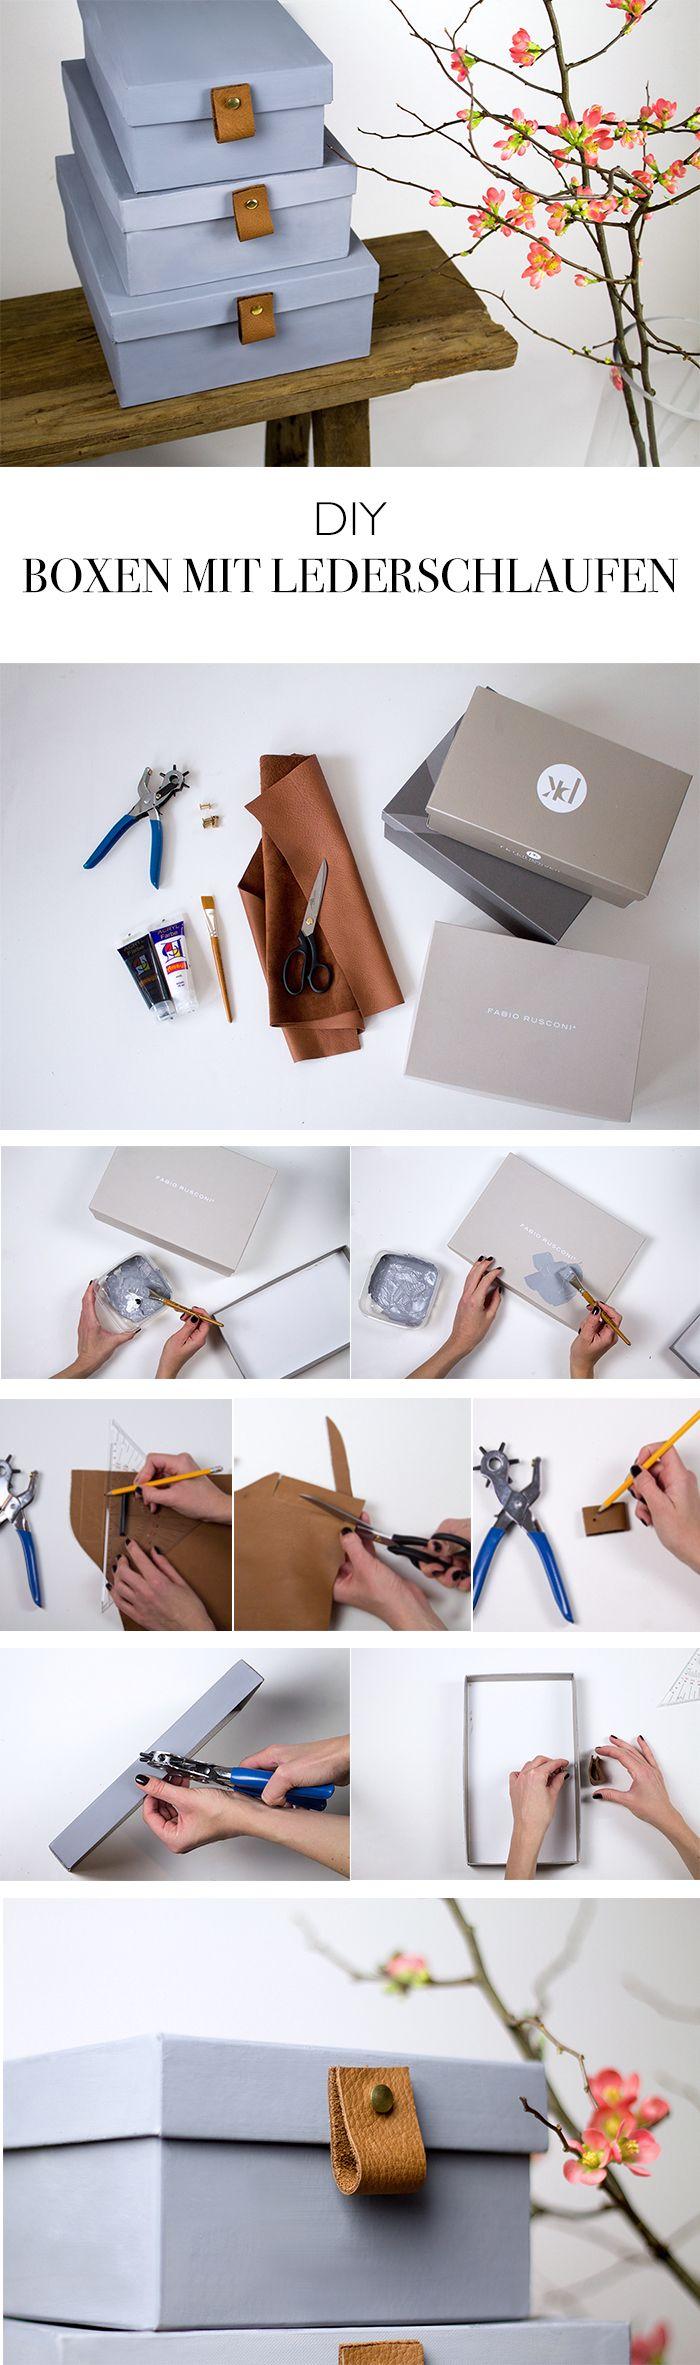 Boxen zur Aufbewahrung mit Lederriemen - DIY Blog aus Berlin lindaloves.de